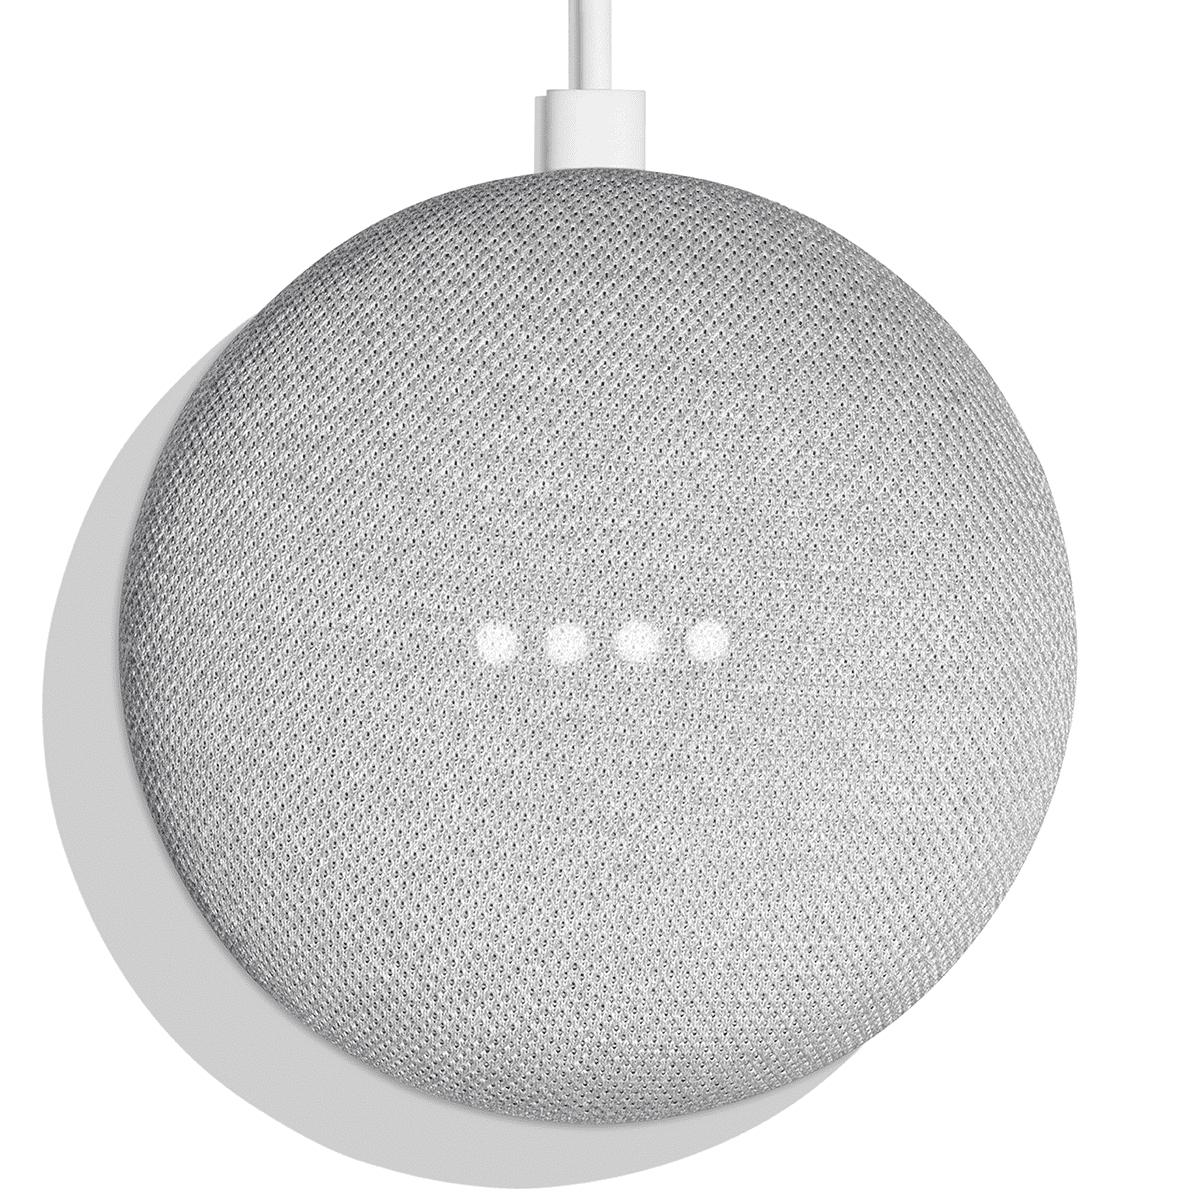 Google Home mini for £20 on Vodafone Veryme Rewards